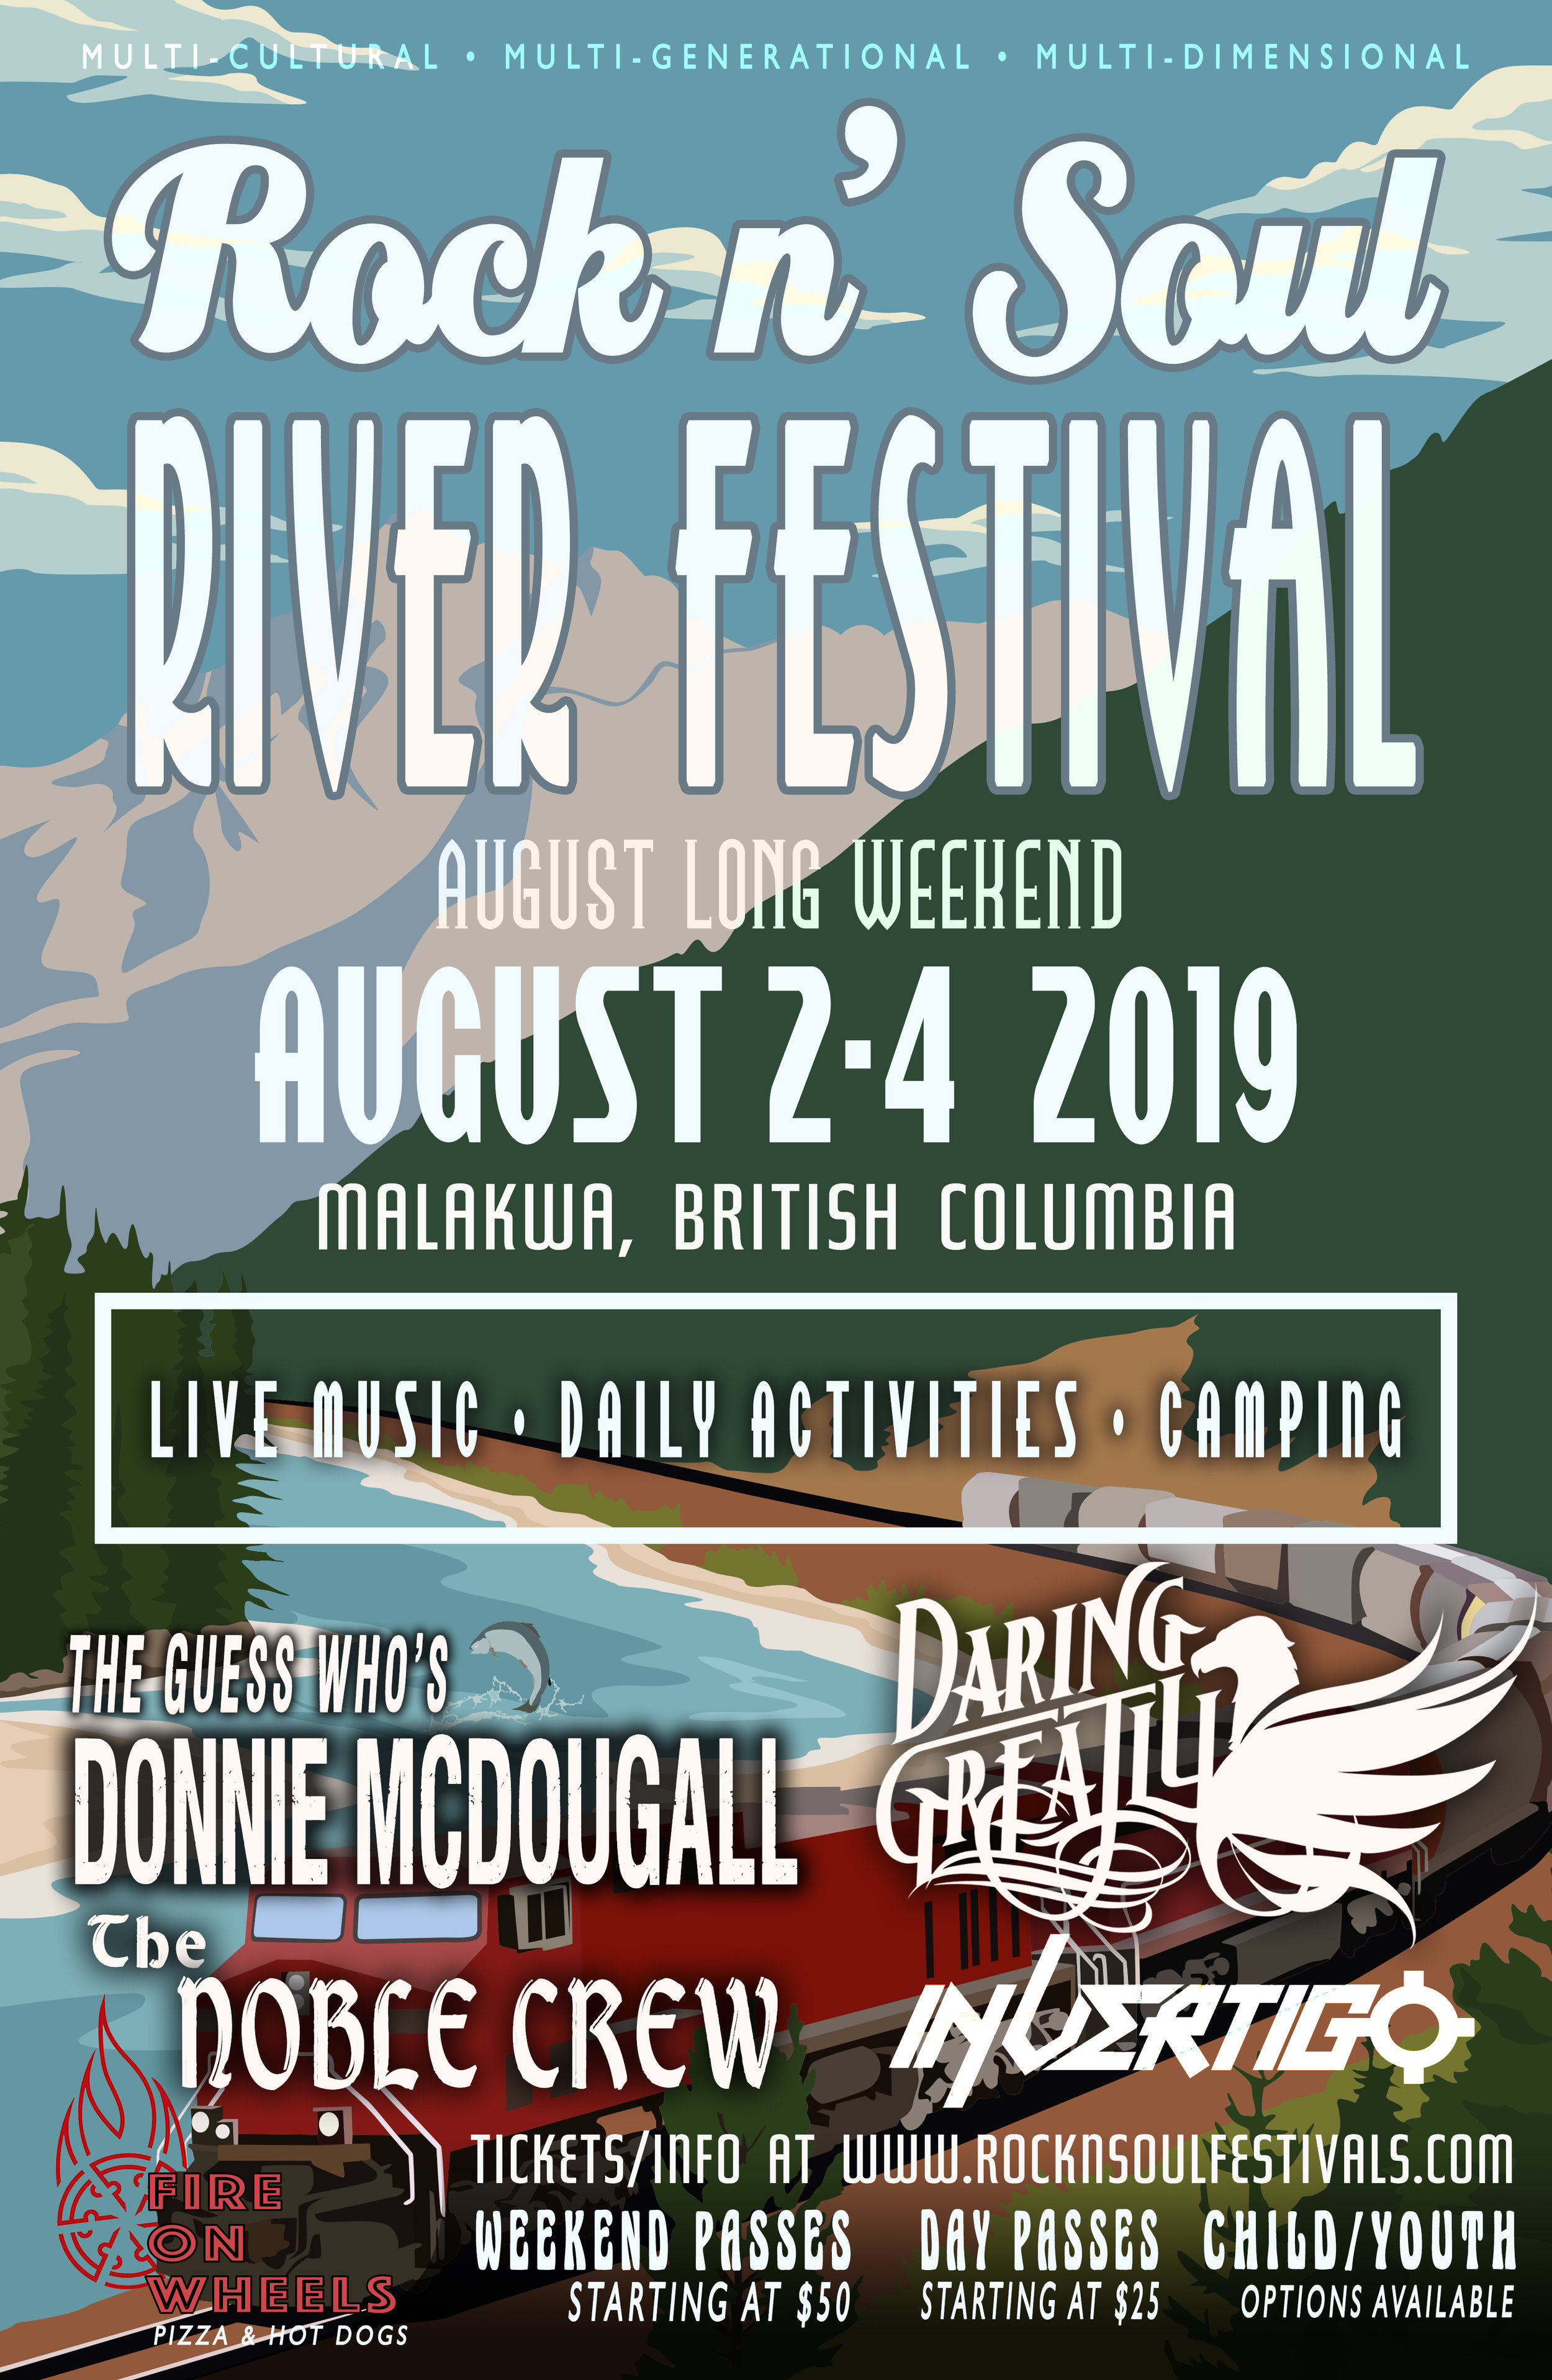 Rock n' Soul River Festival - Malakwa, BC — Daring Greatly